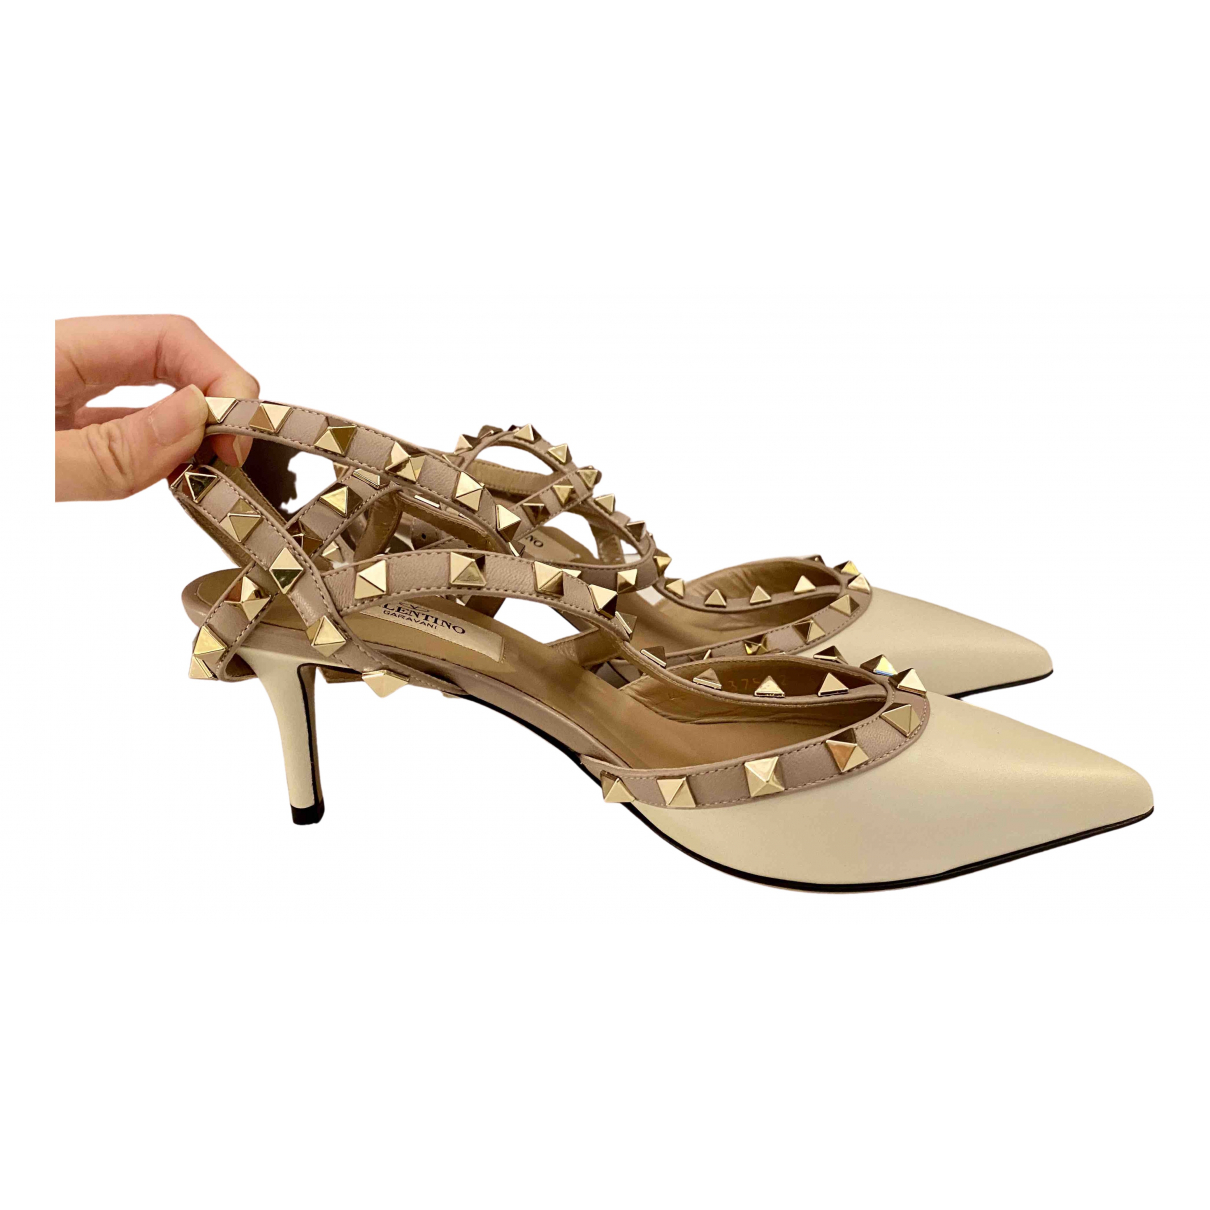 Valentino Garavani Rockstud White Leather Heels for Women 37 EU